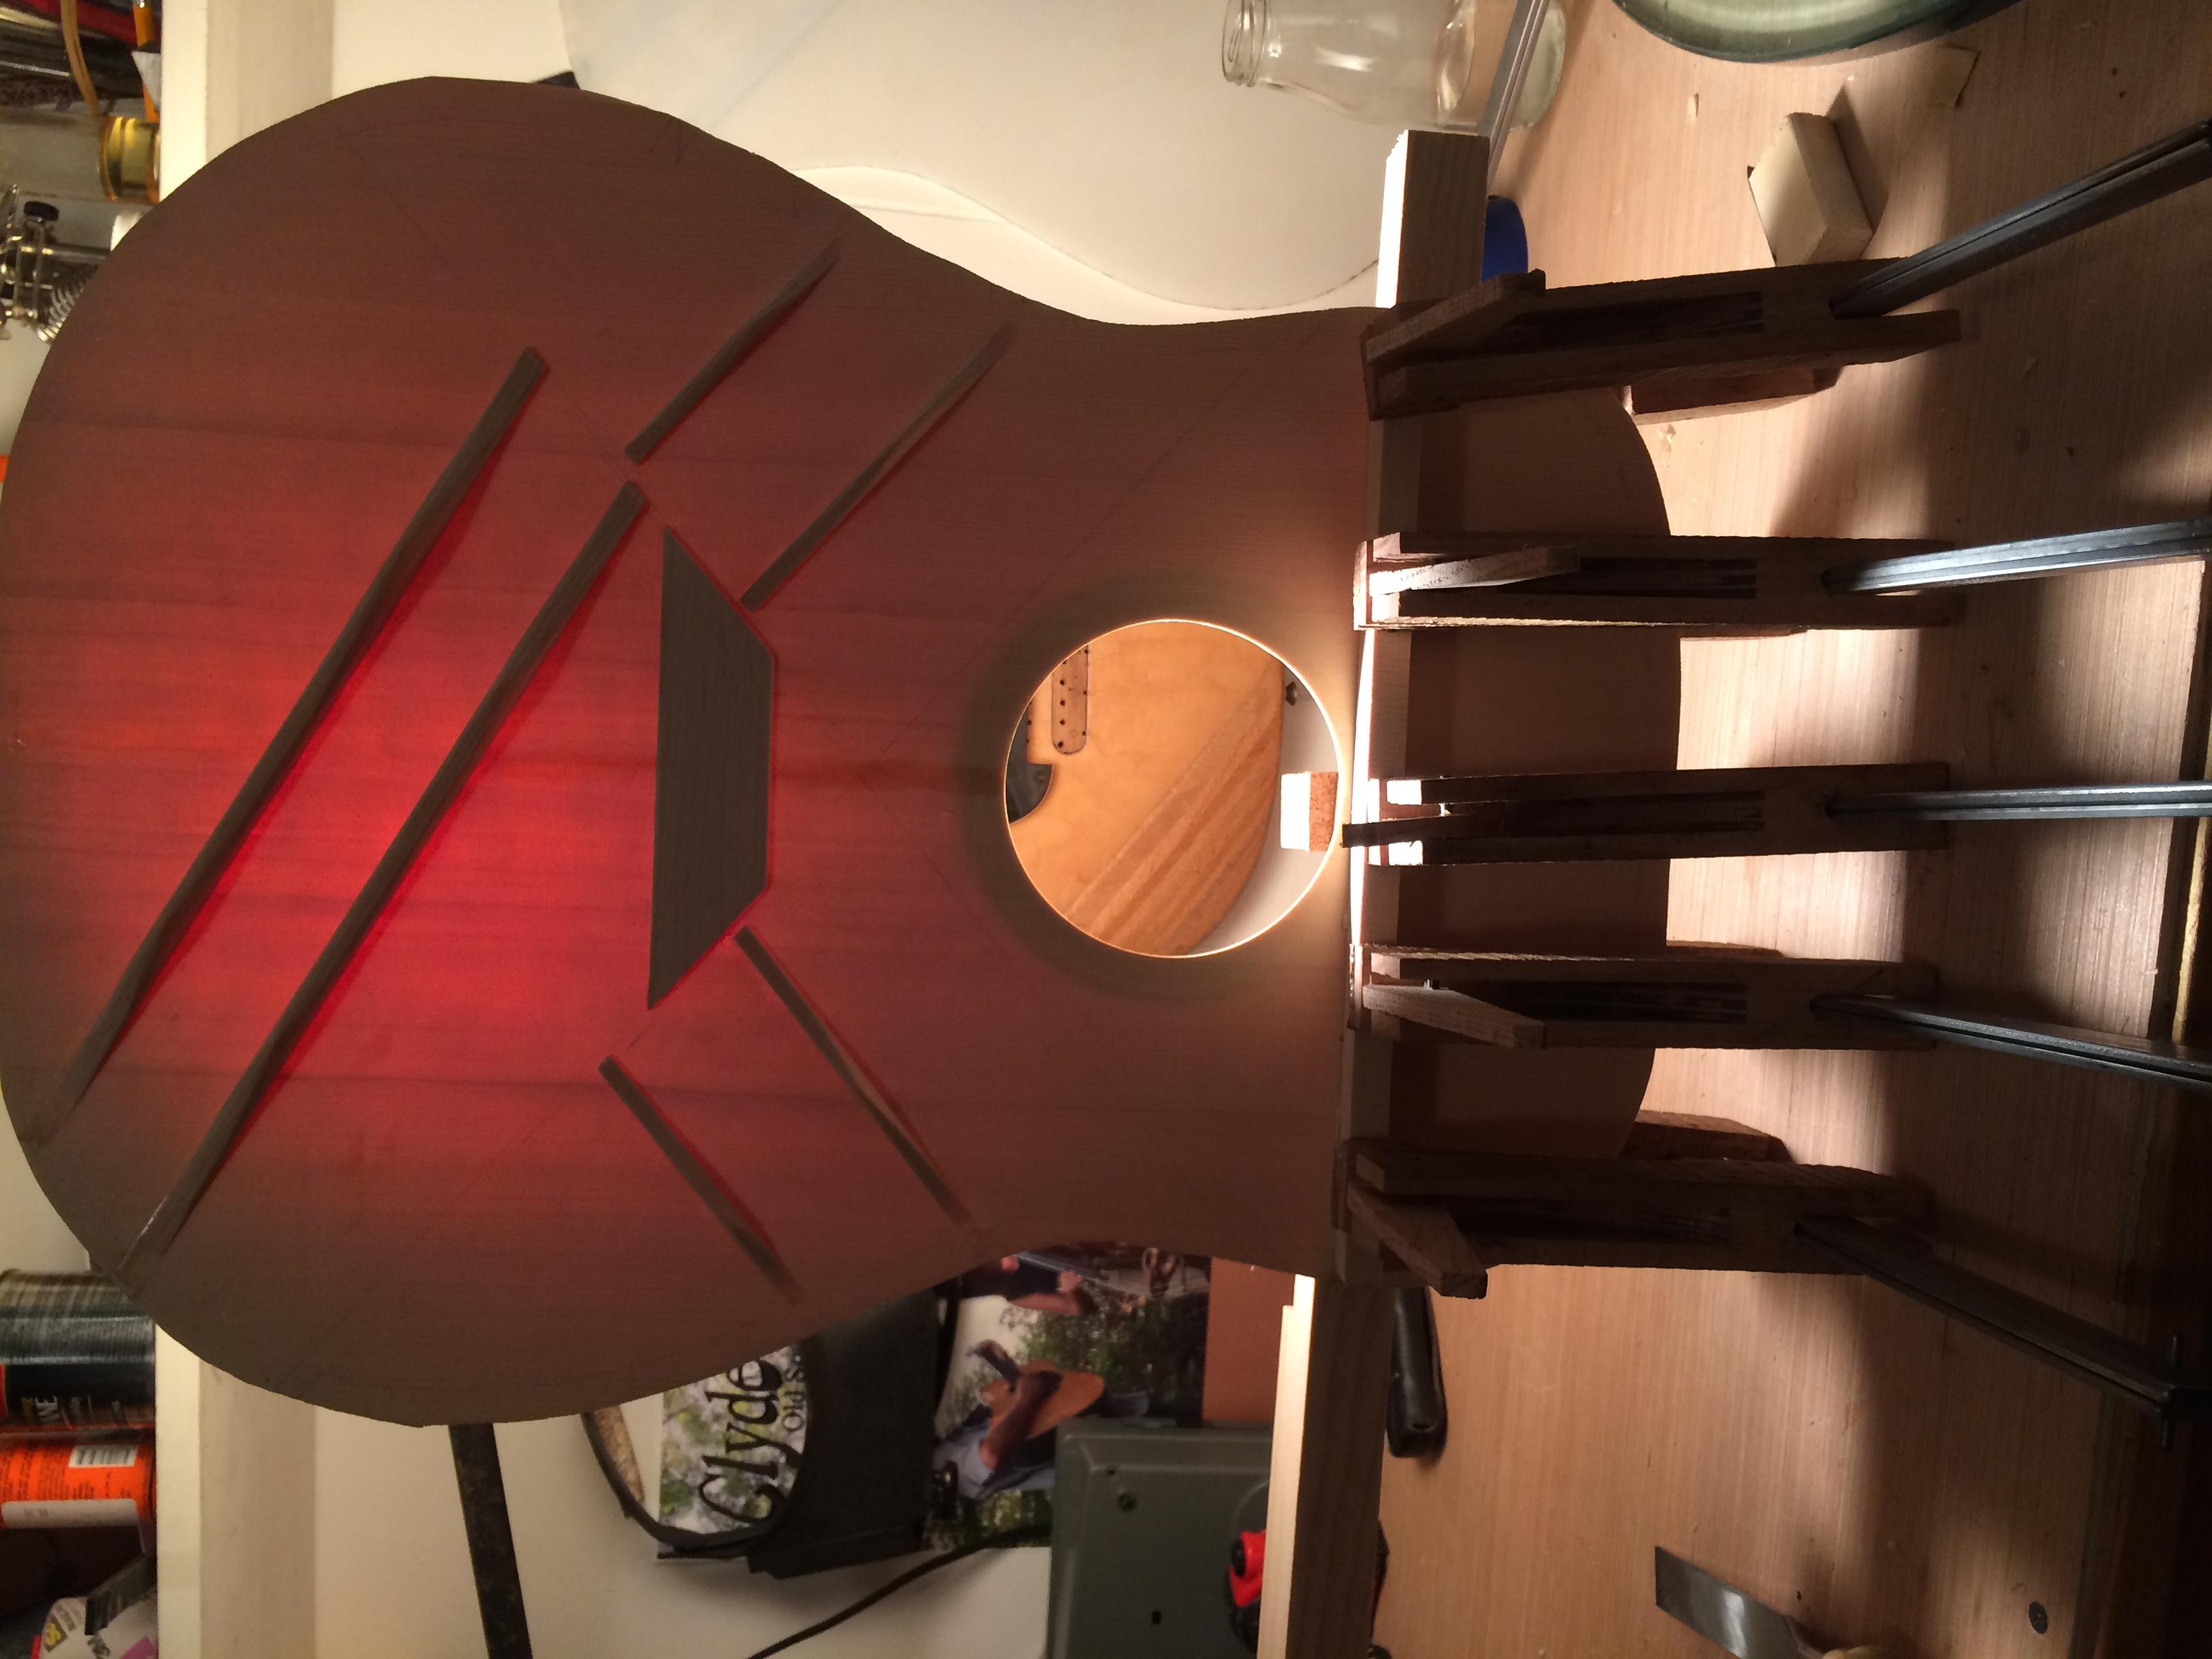 Tucked Braces on a Sitka Soundboard